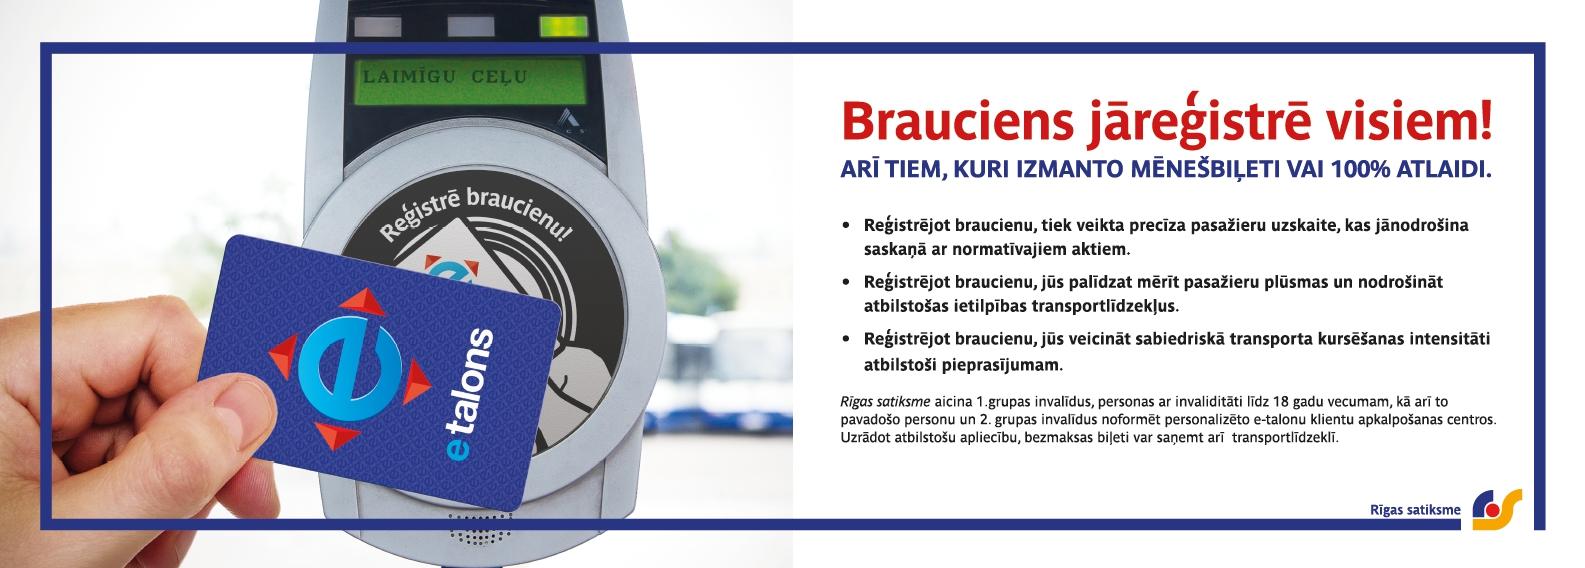 """Rīgas satiksme"" reminds: everybody has to register his or ..."